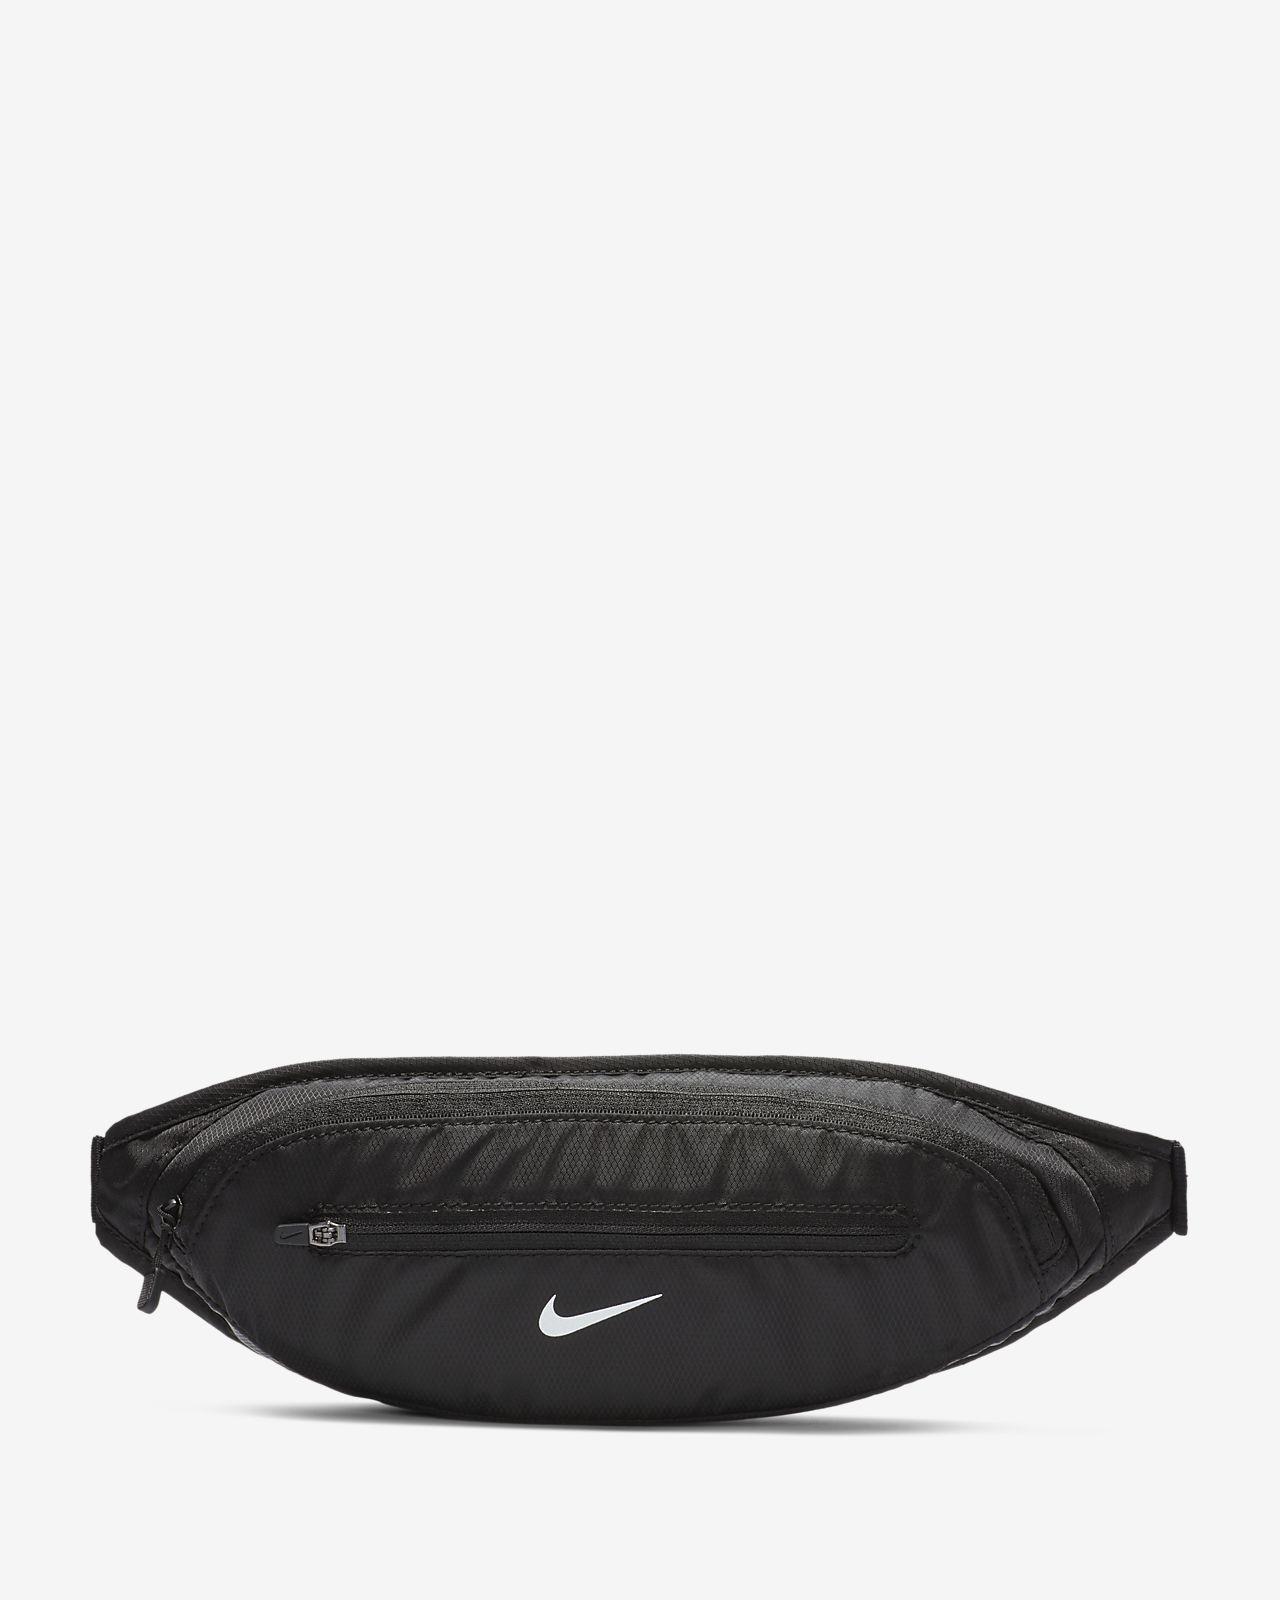 Nike 腰包 2.0